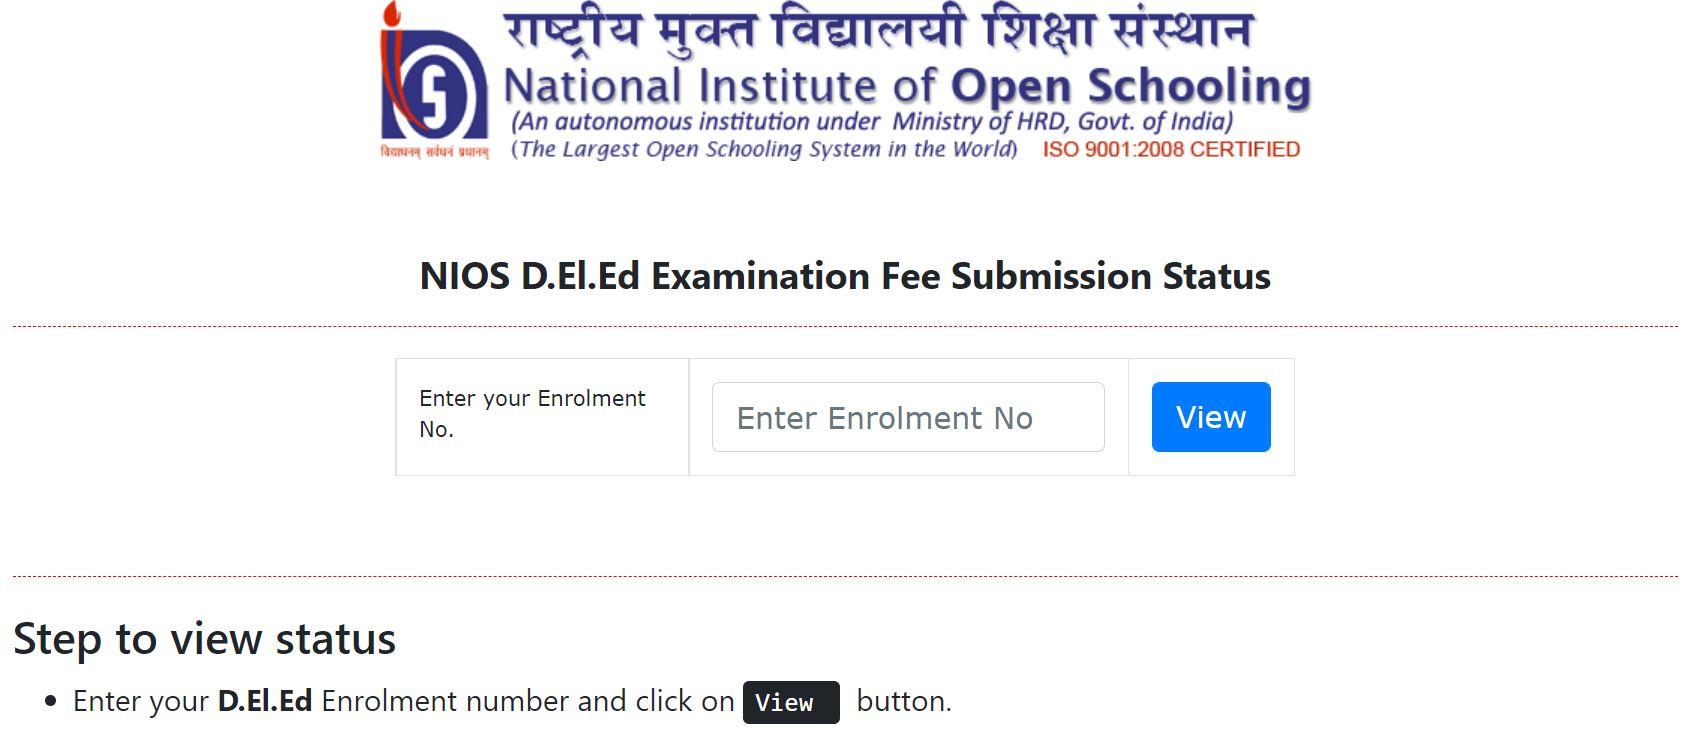 NIOS Deled Exam Form